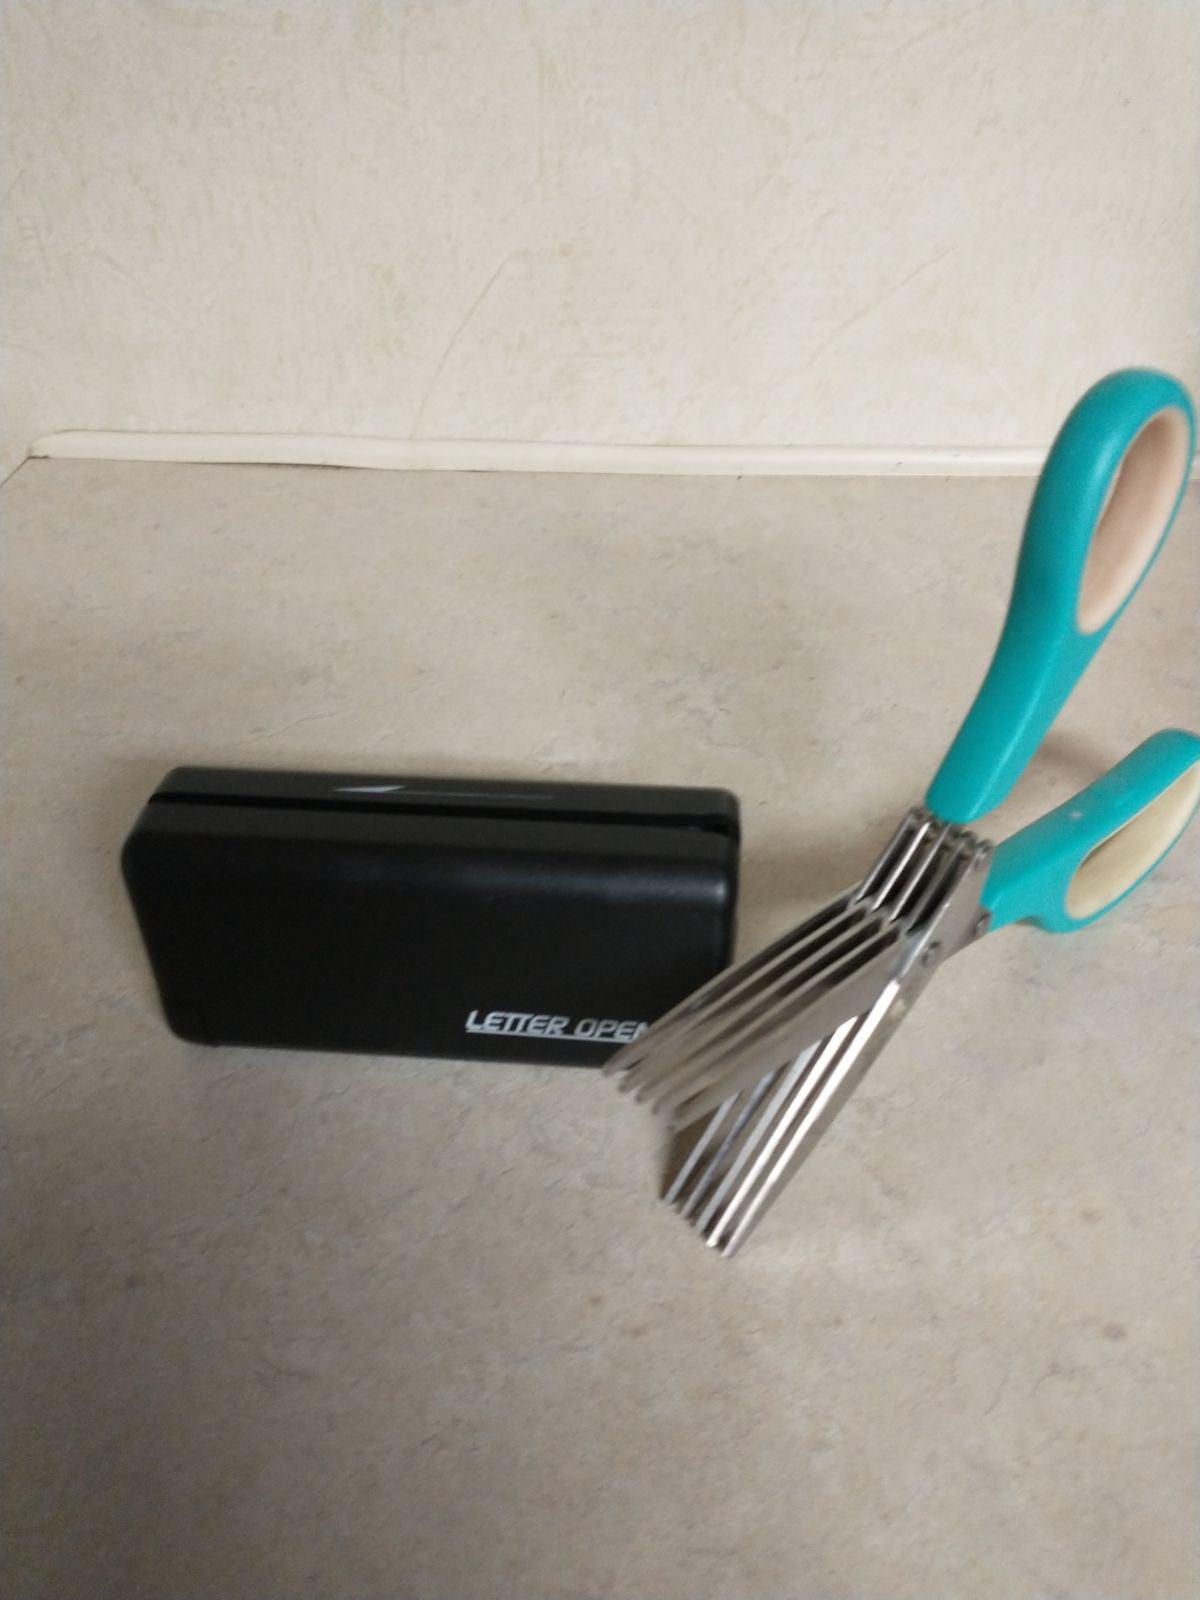 5 slot scissors & electronic letter open